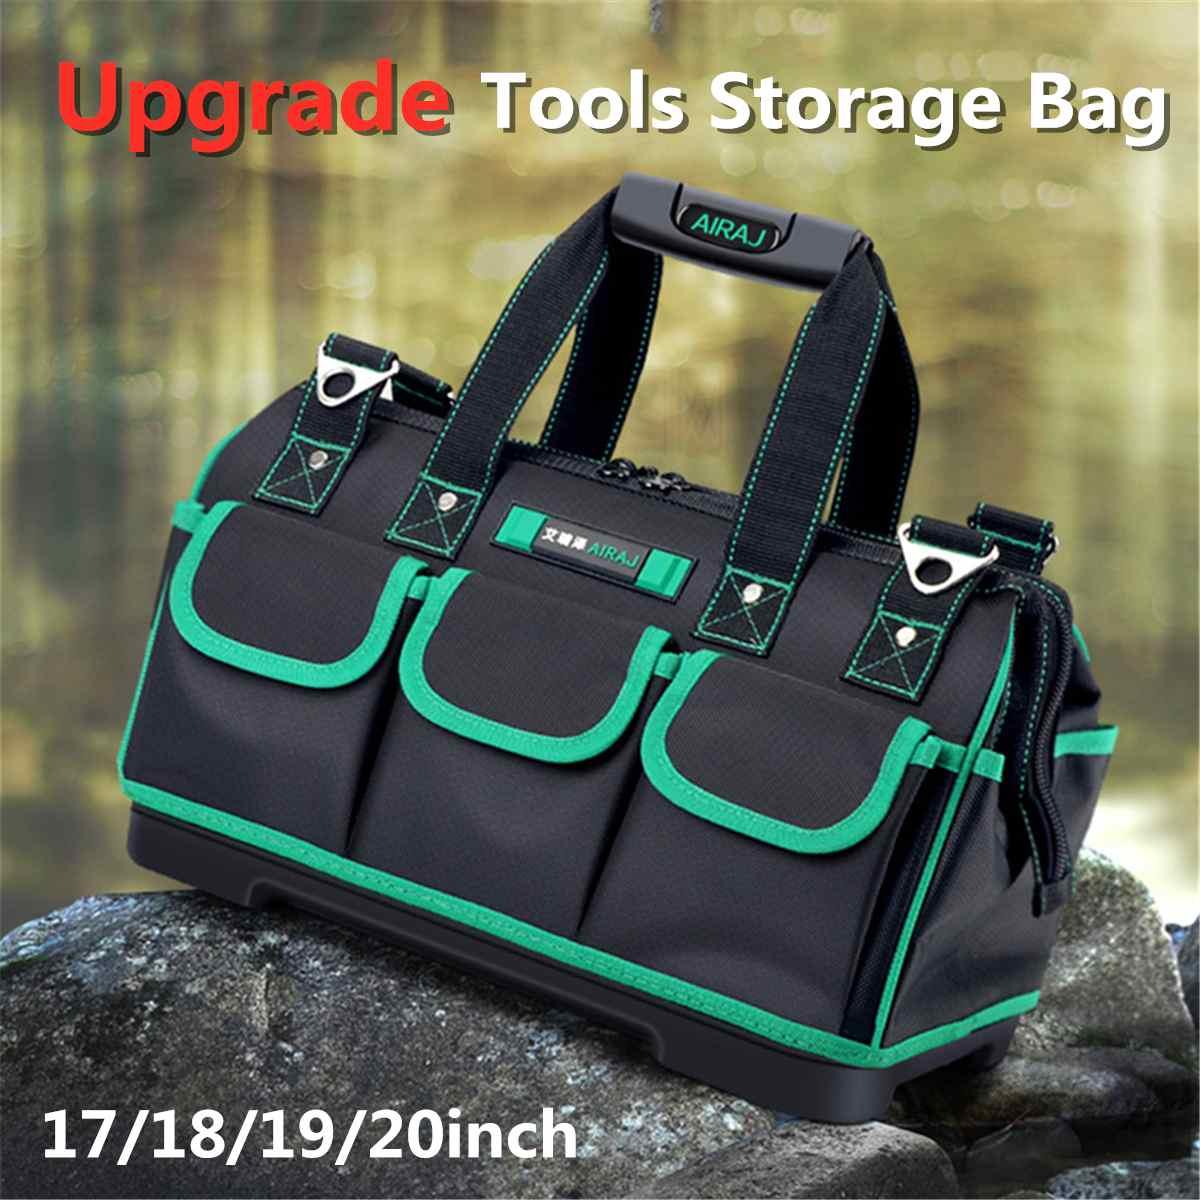 Tool Bag Oxford Cloth Waterproof Tool Bags Electrician Portable Multi Function Work Bag Utility Tool Organizer Storage Bag